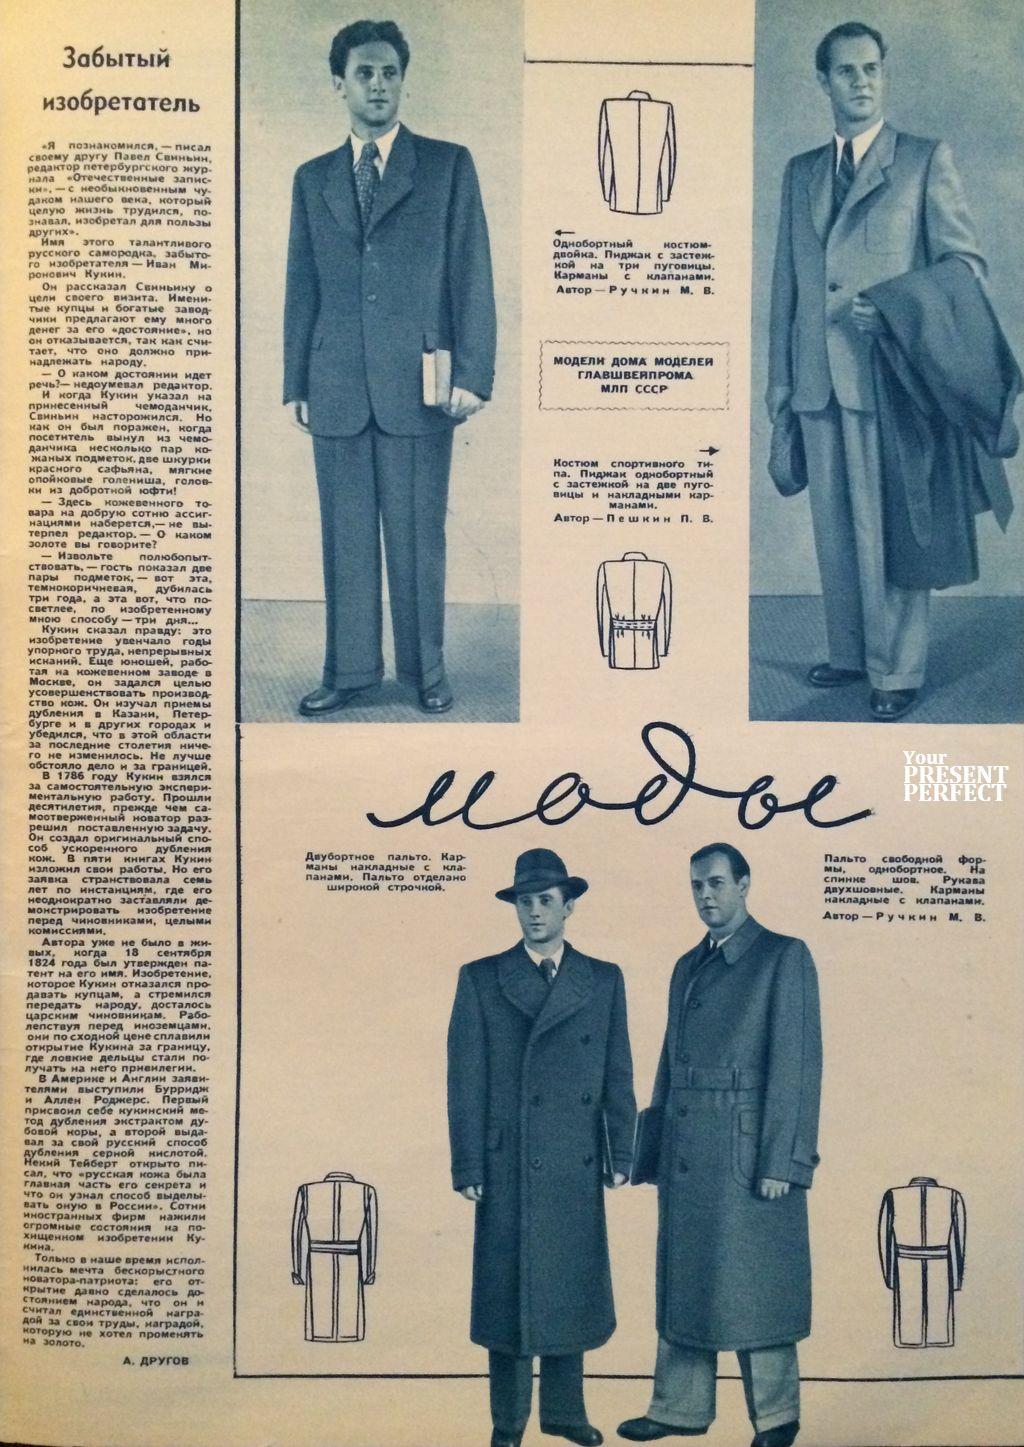 Мода СССР 1950 год. Журнал Огонек.